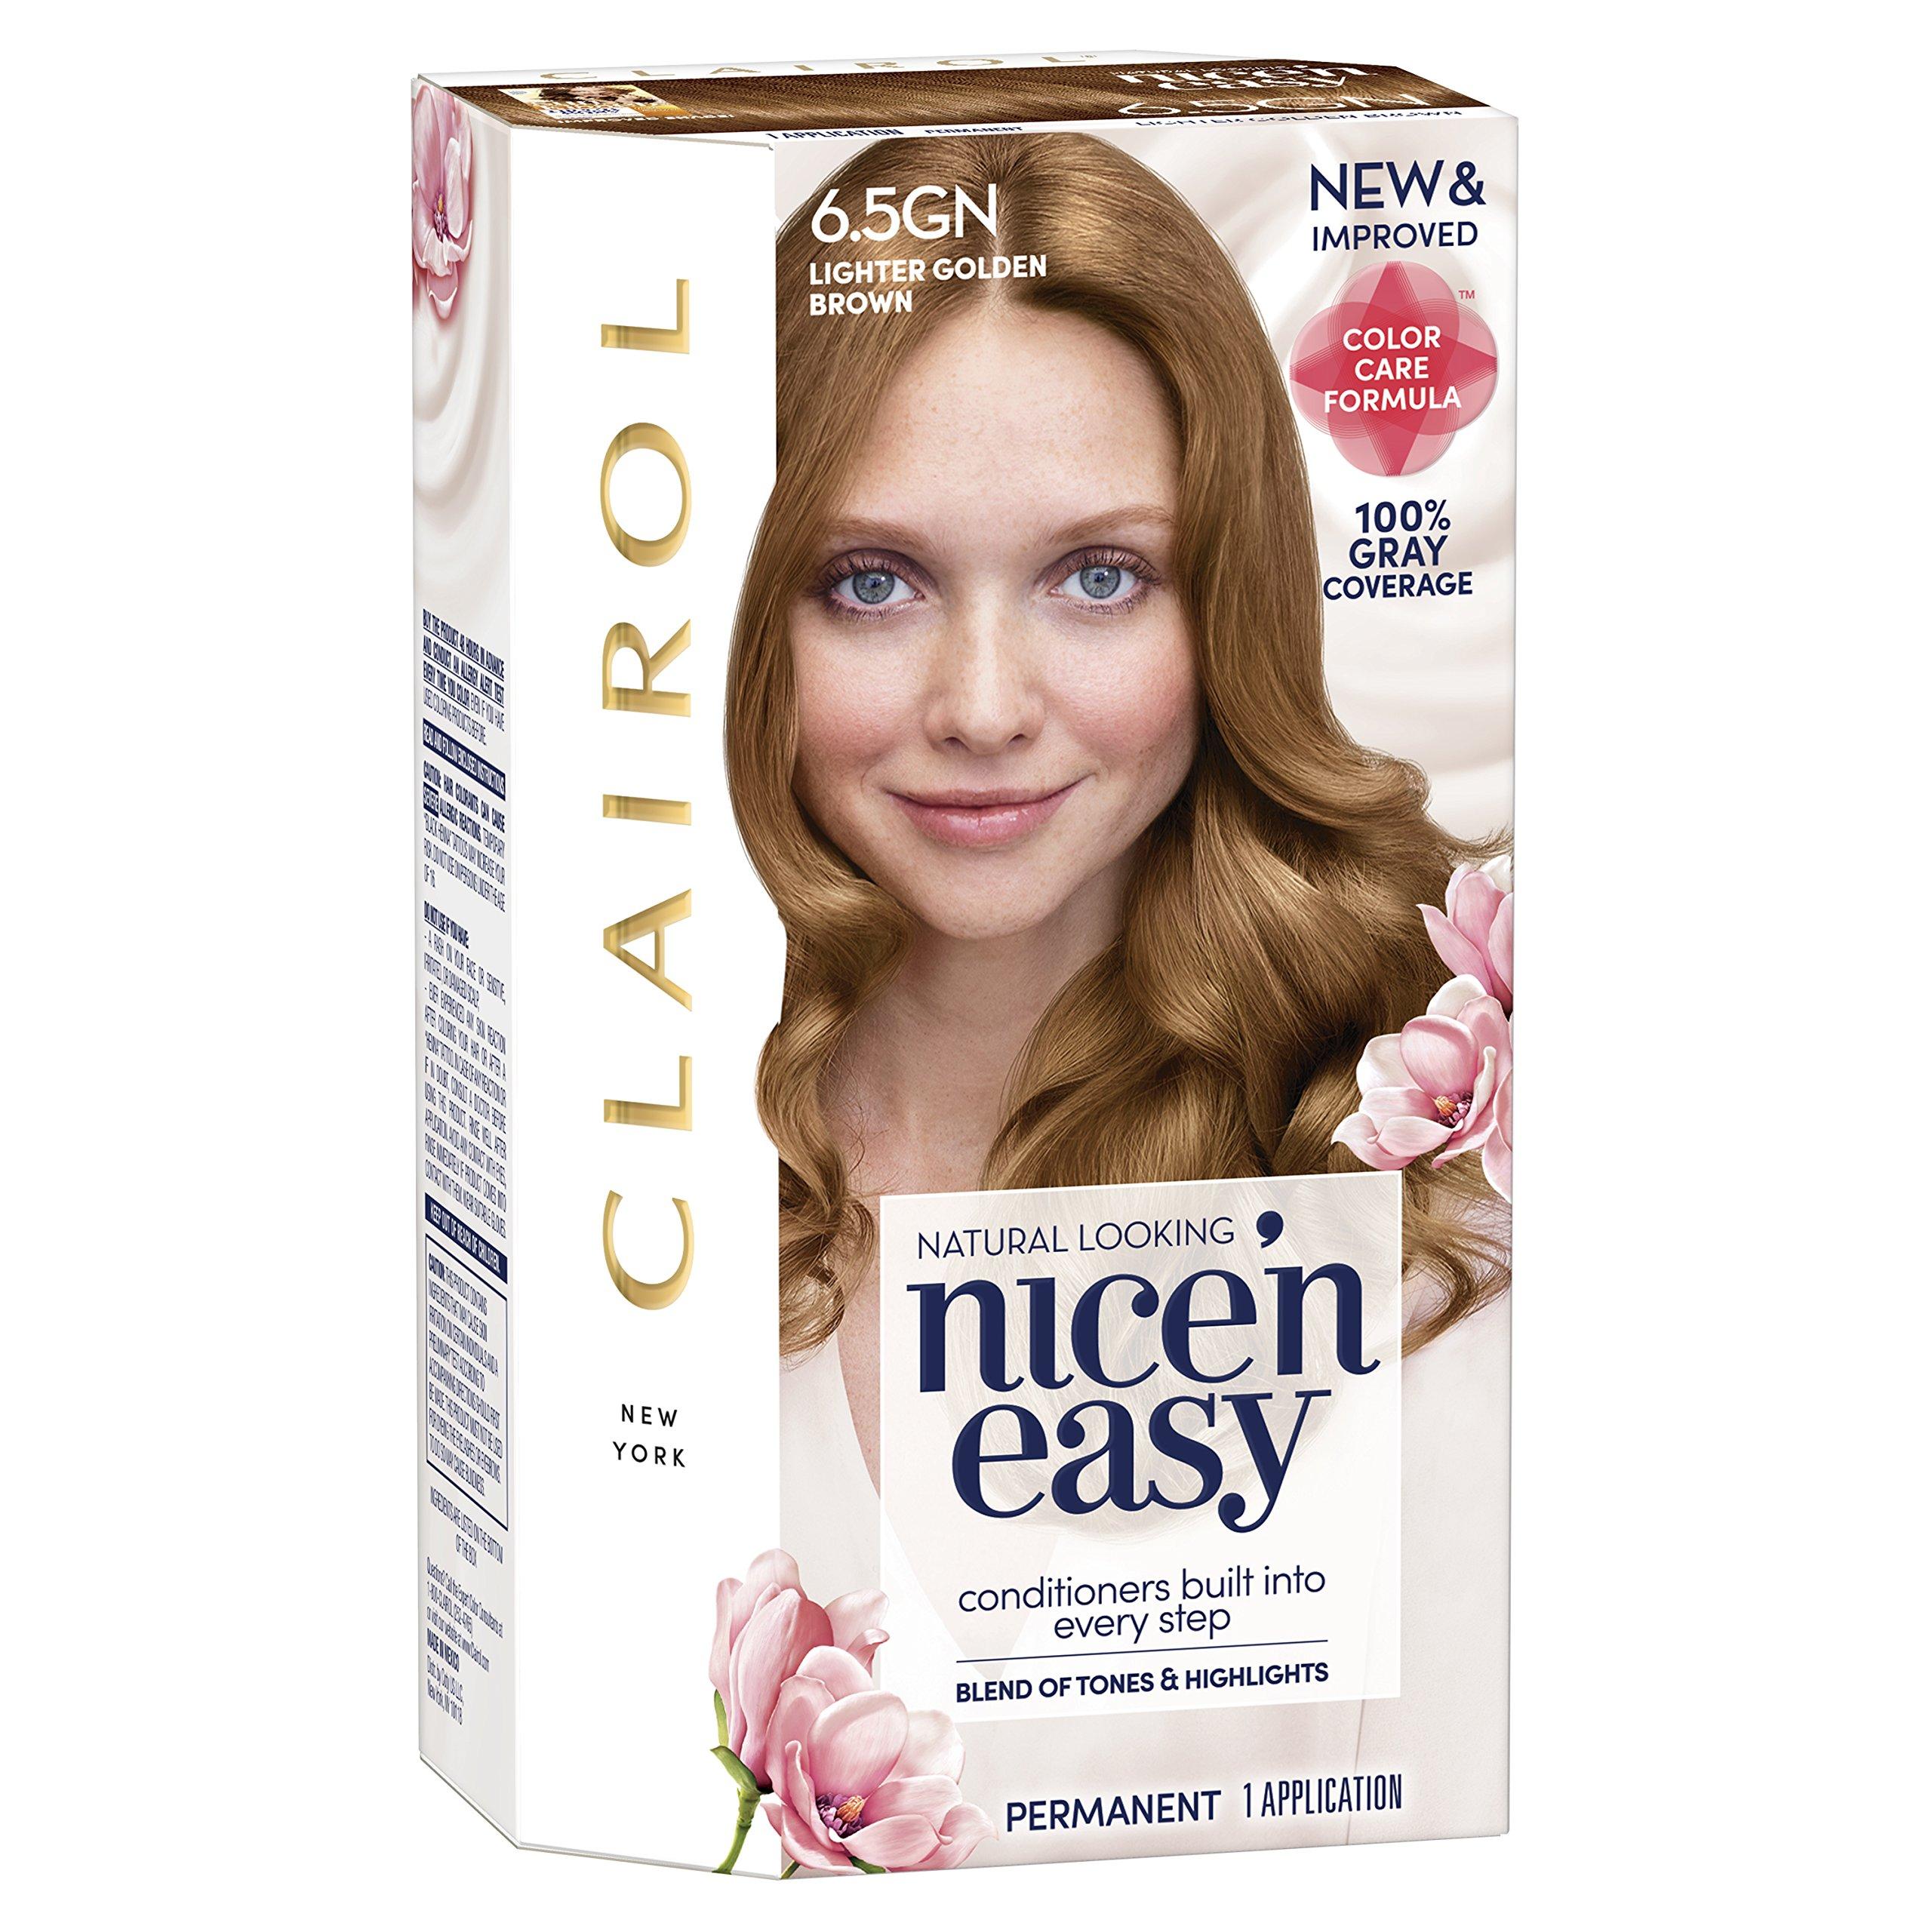 Clairol Nice N Easy 65gn Lighter Golden Brown Permanent Hair